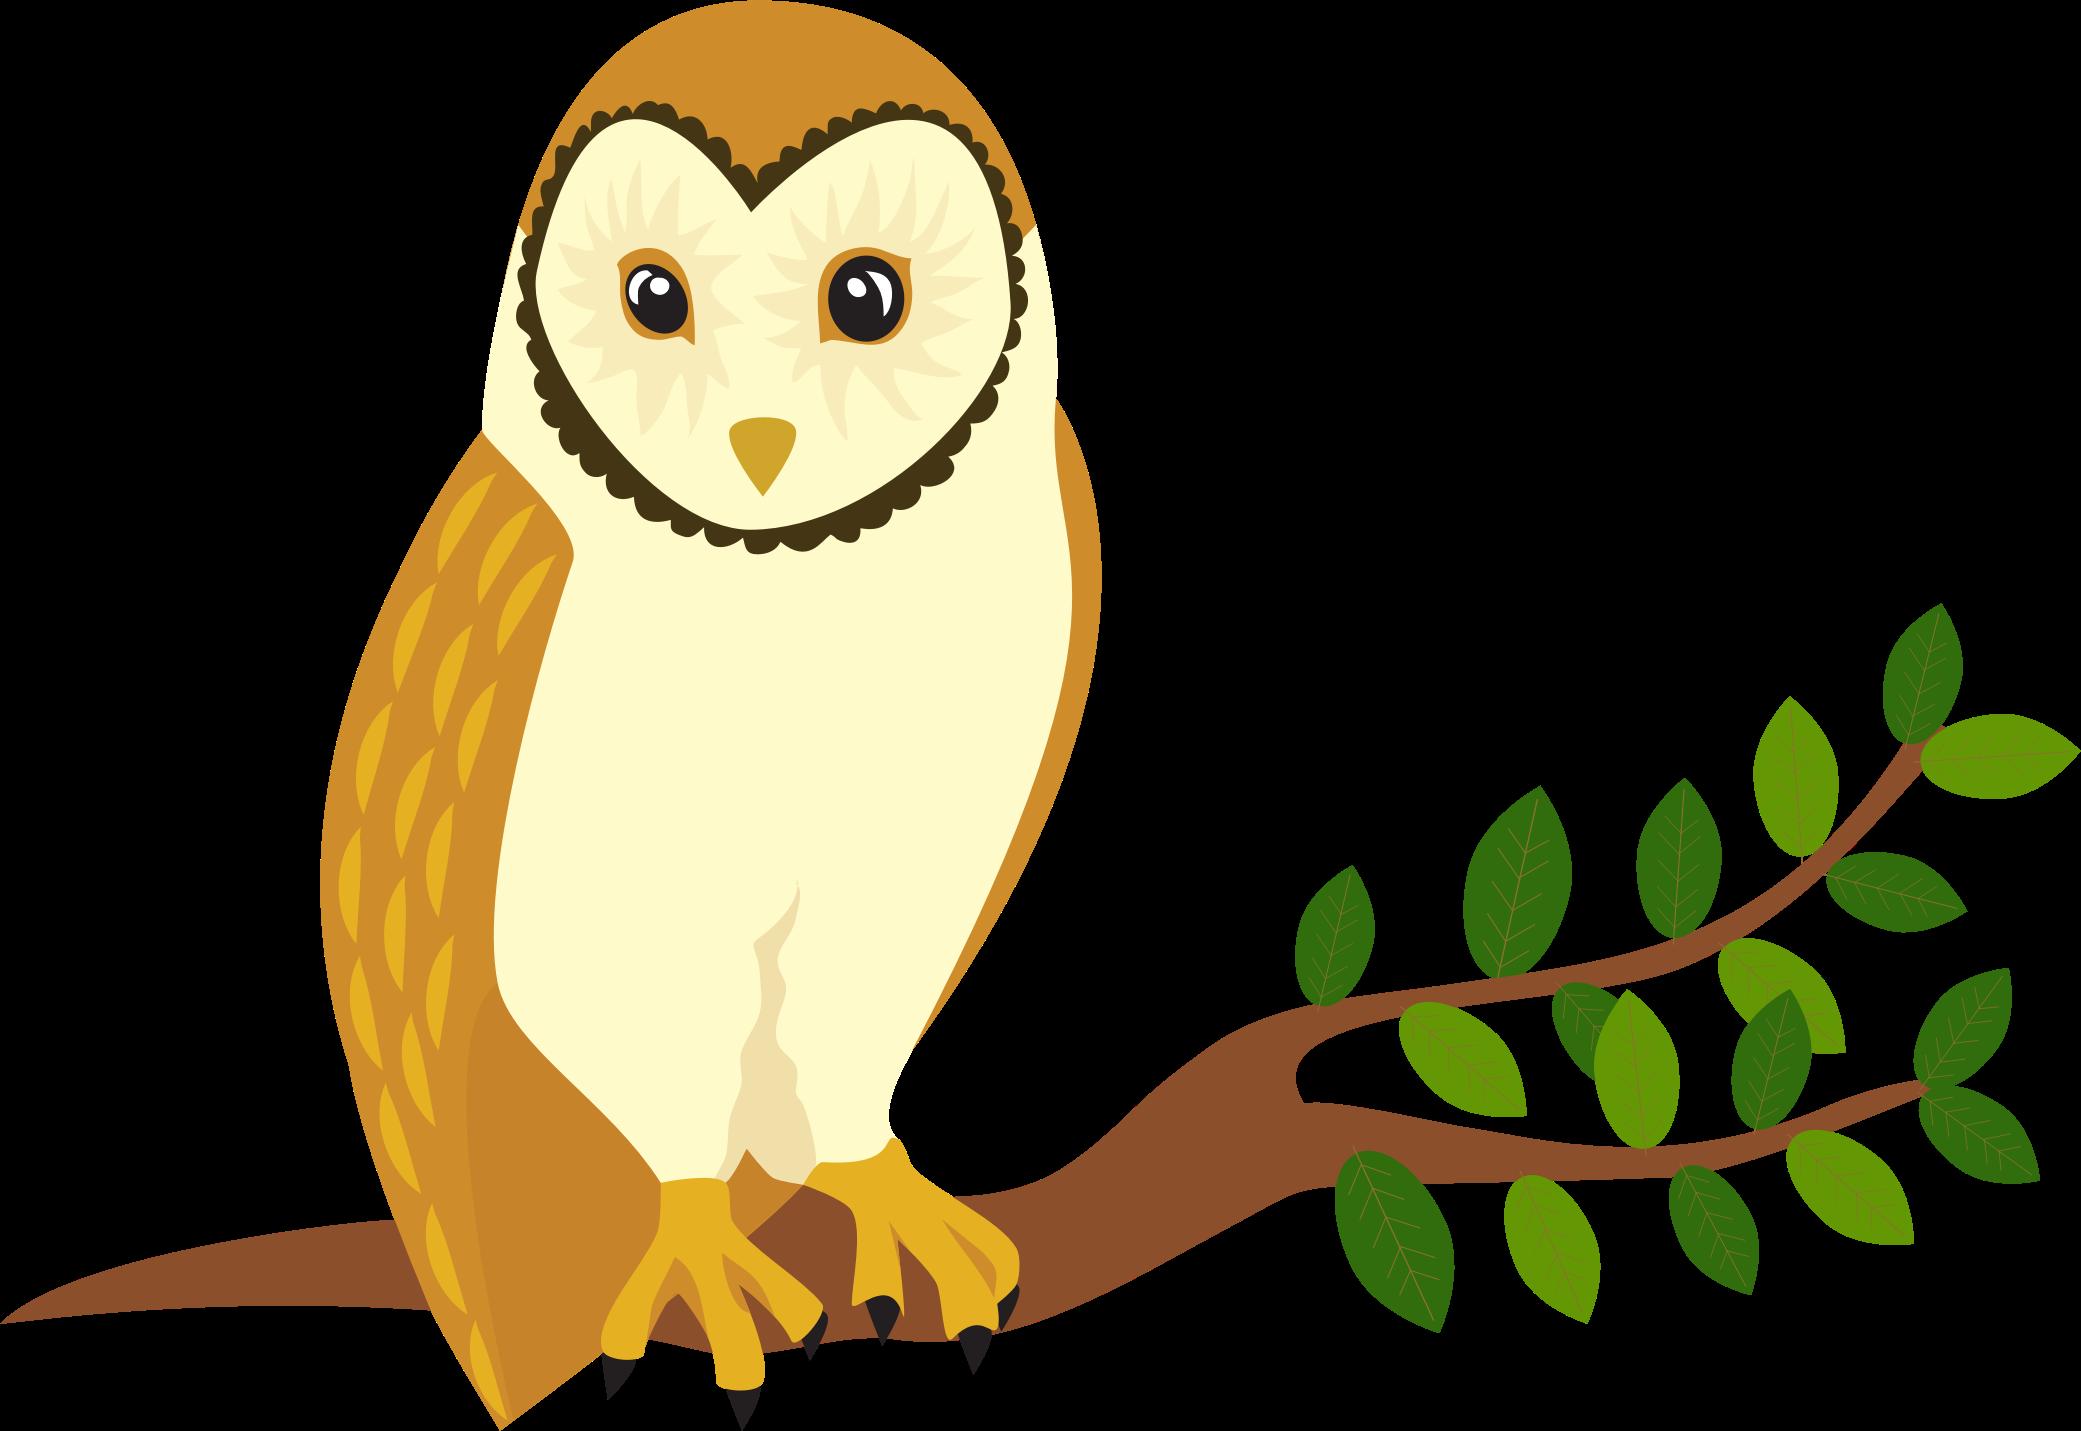 Perched big image png. Clipart bird owl